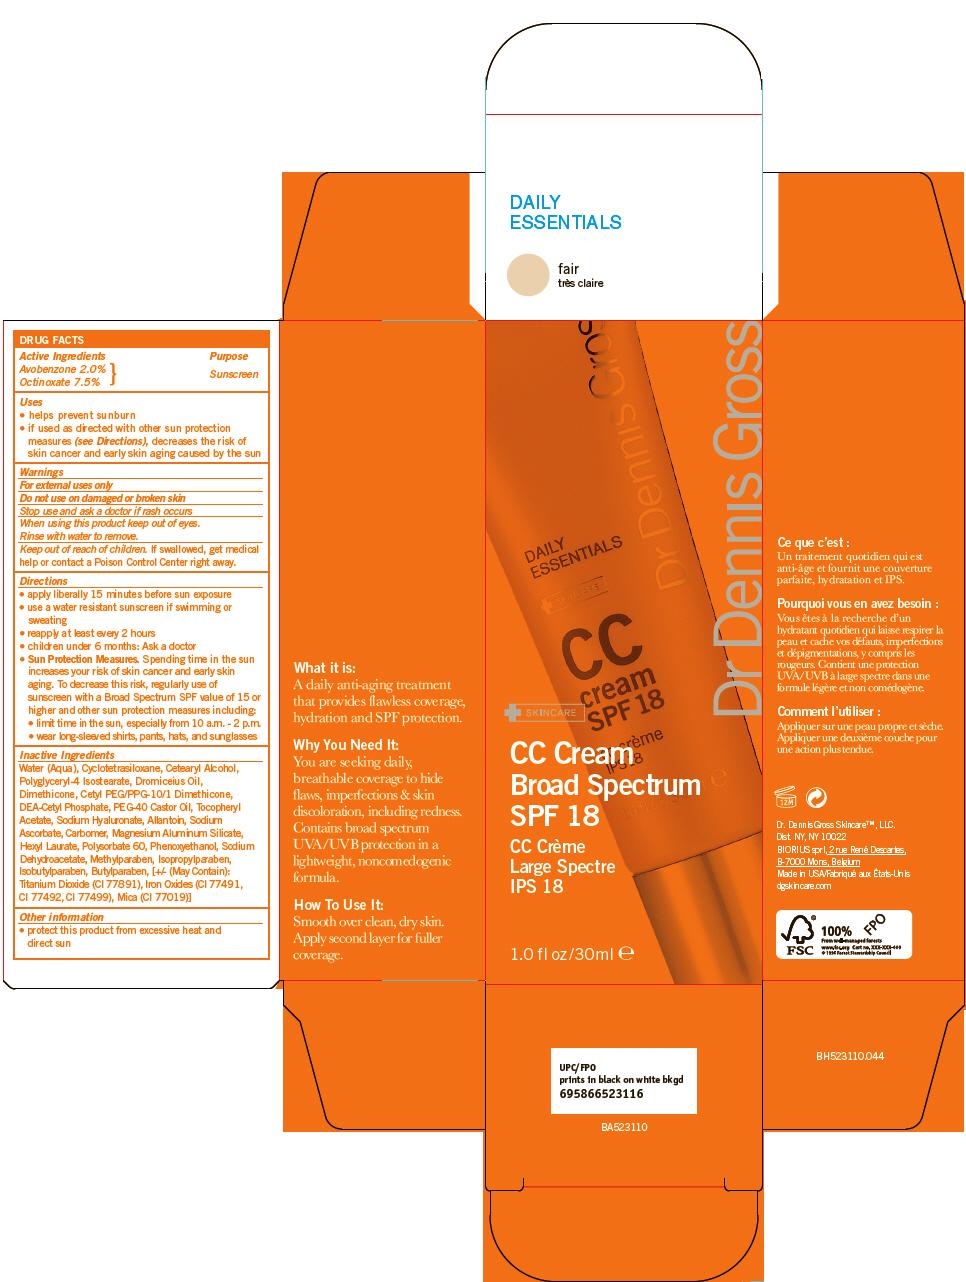 Cc Spf 18 Fair (Avobenzone, Octinoxate) Cream Cc Spf 18 Light To Medium (Avobenzone, Octinoxate) Cream Cc Spf 18 Medium (Avobenzone, Octinoxate) Cream Cc Spf 18 Medium To Dark (Avobenzone, Octinoxate) Cream [Dr. Dennis Gross Skincare, Llc]